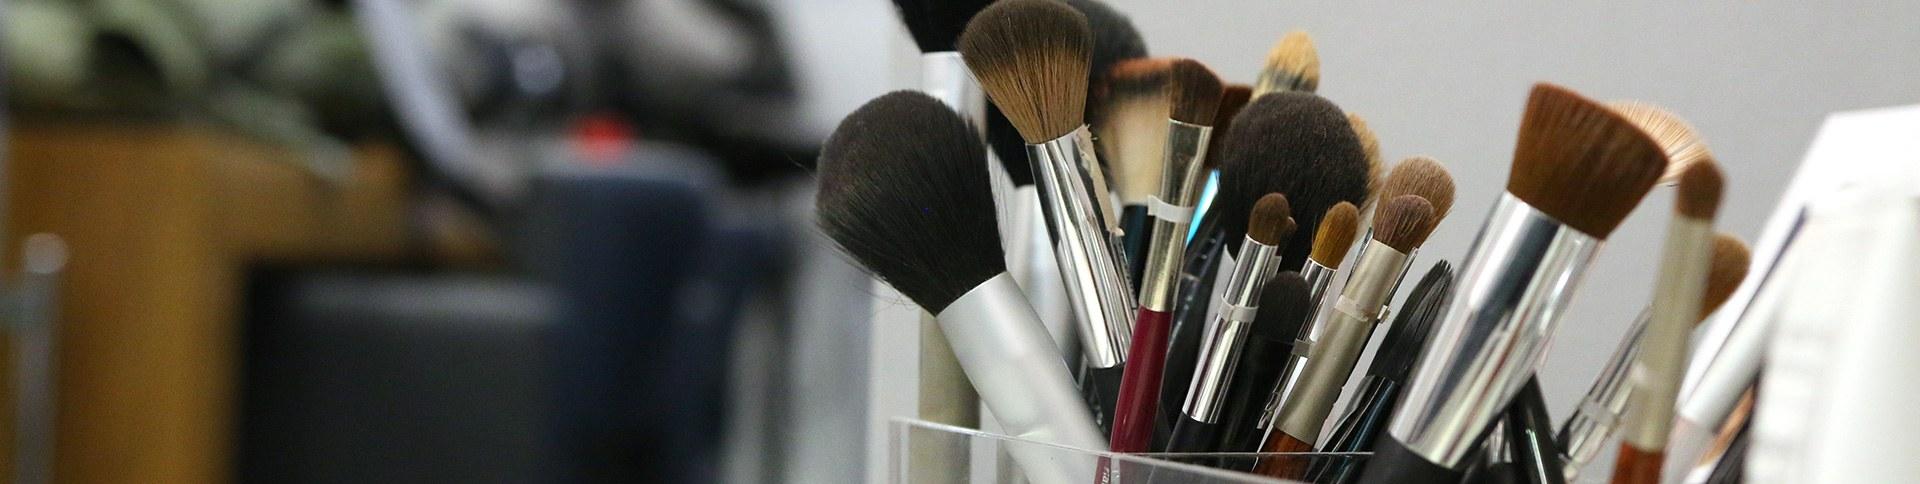 Figaro der Friseur Perfektes Styling und Makeup